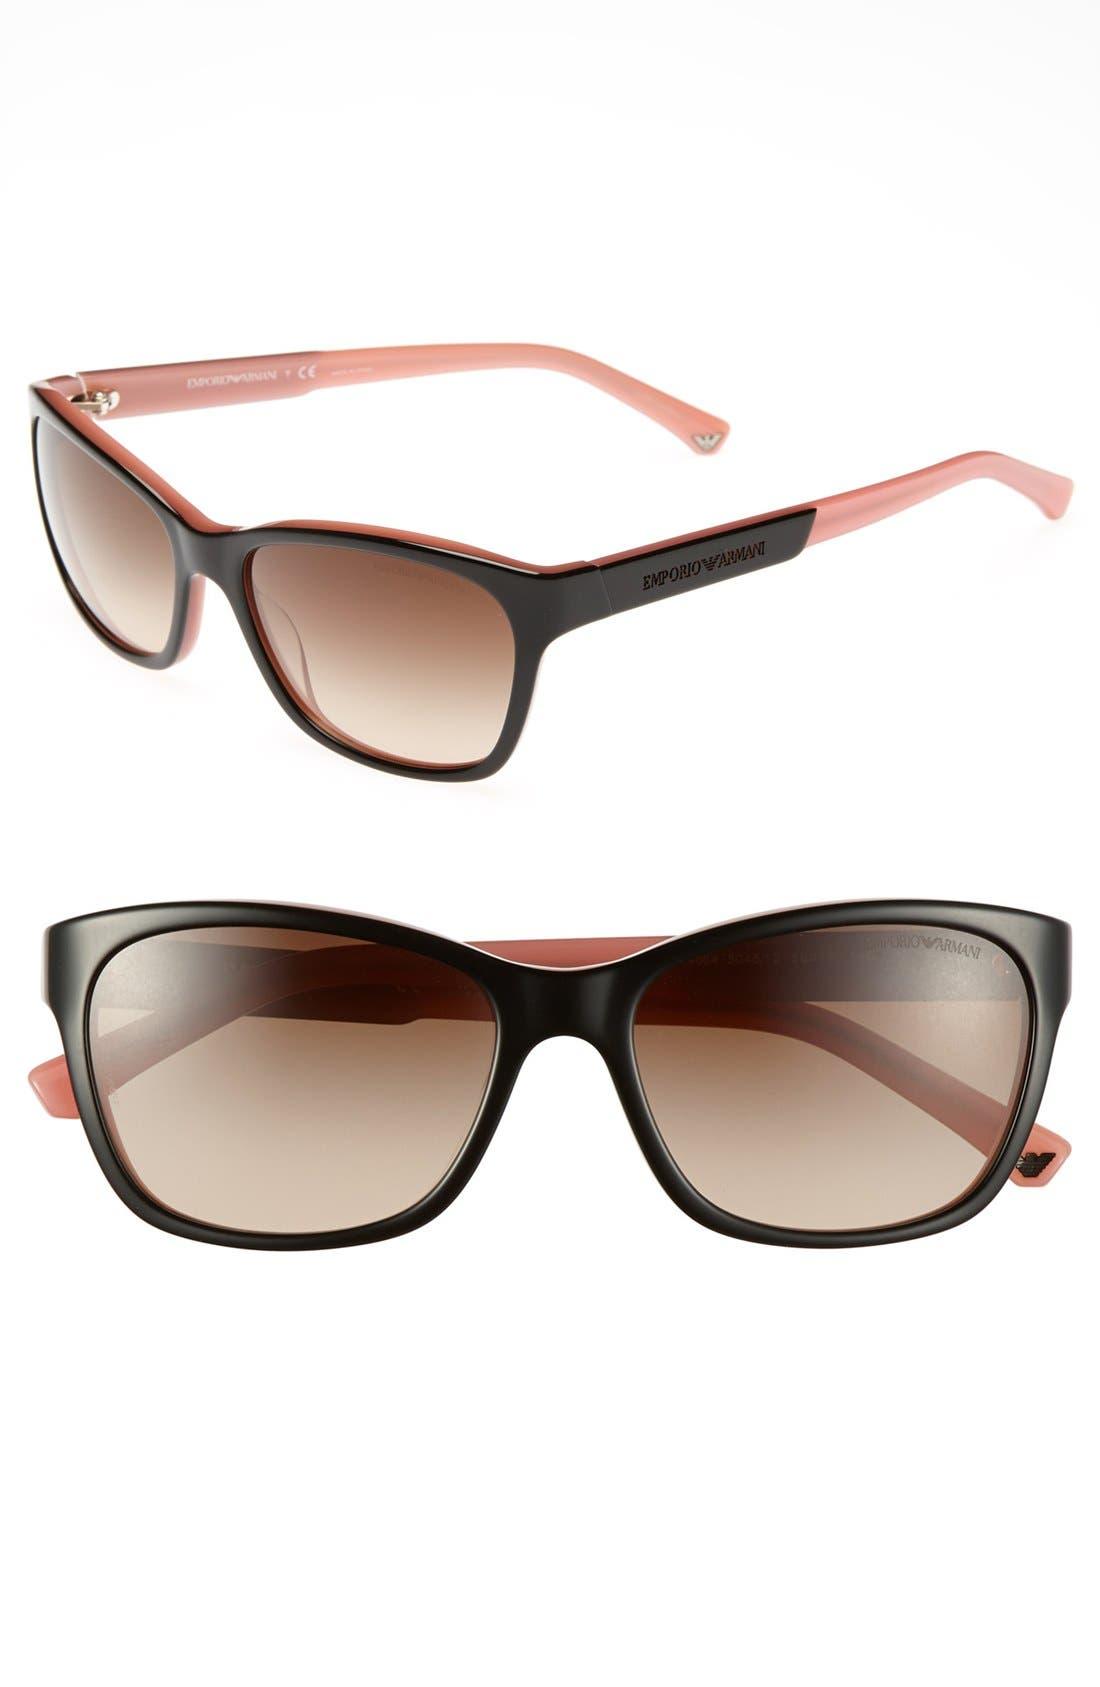 Alternate Image 1 Selected - Emporio Armani 56mm Retro Sunglasses